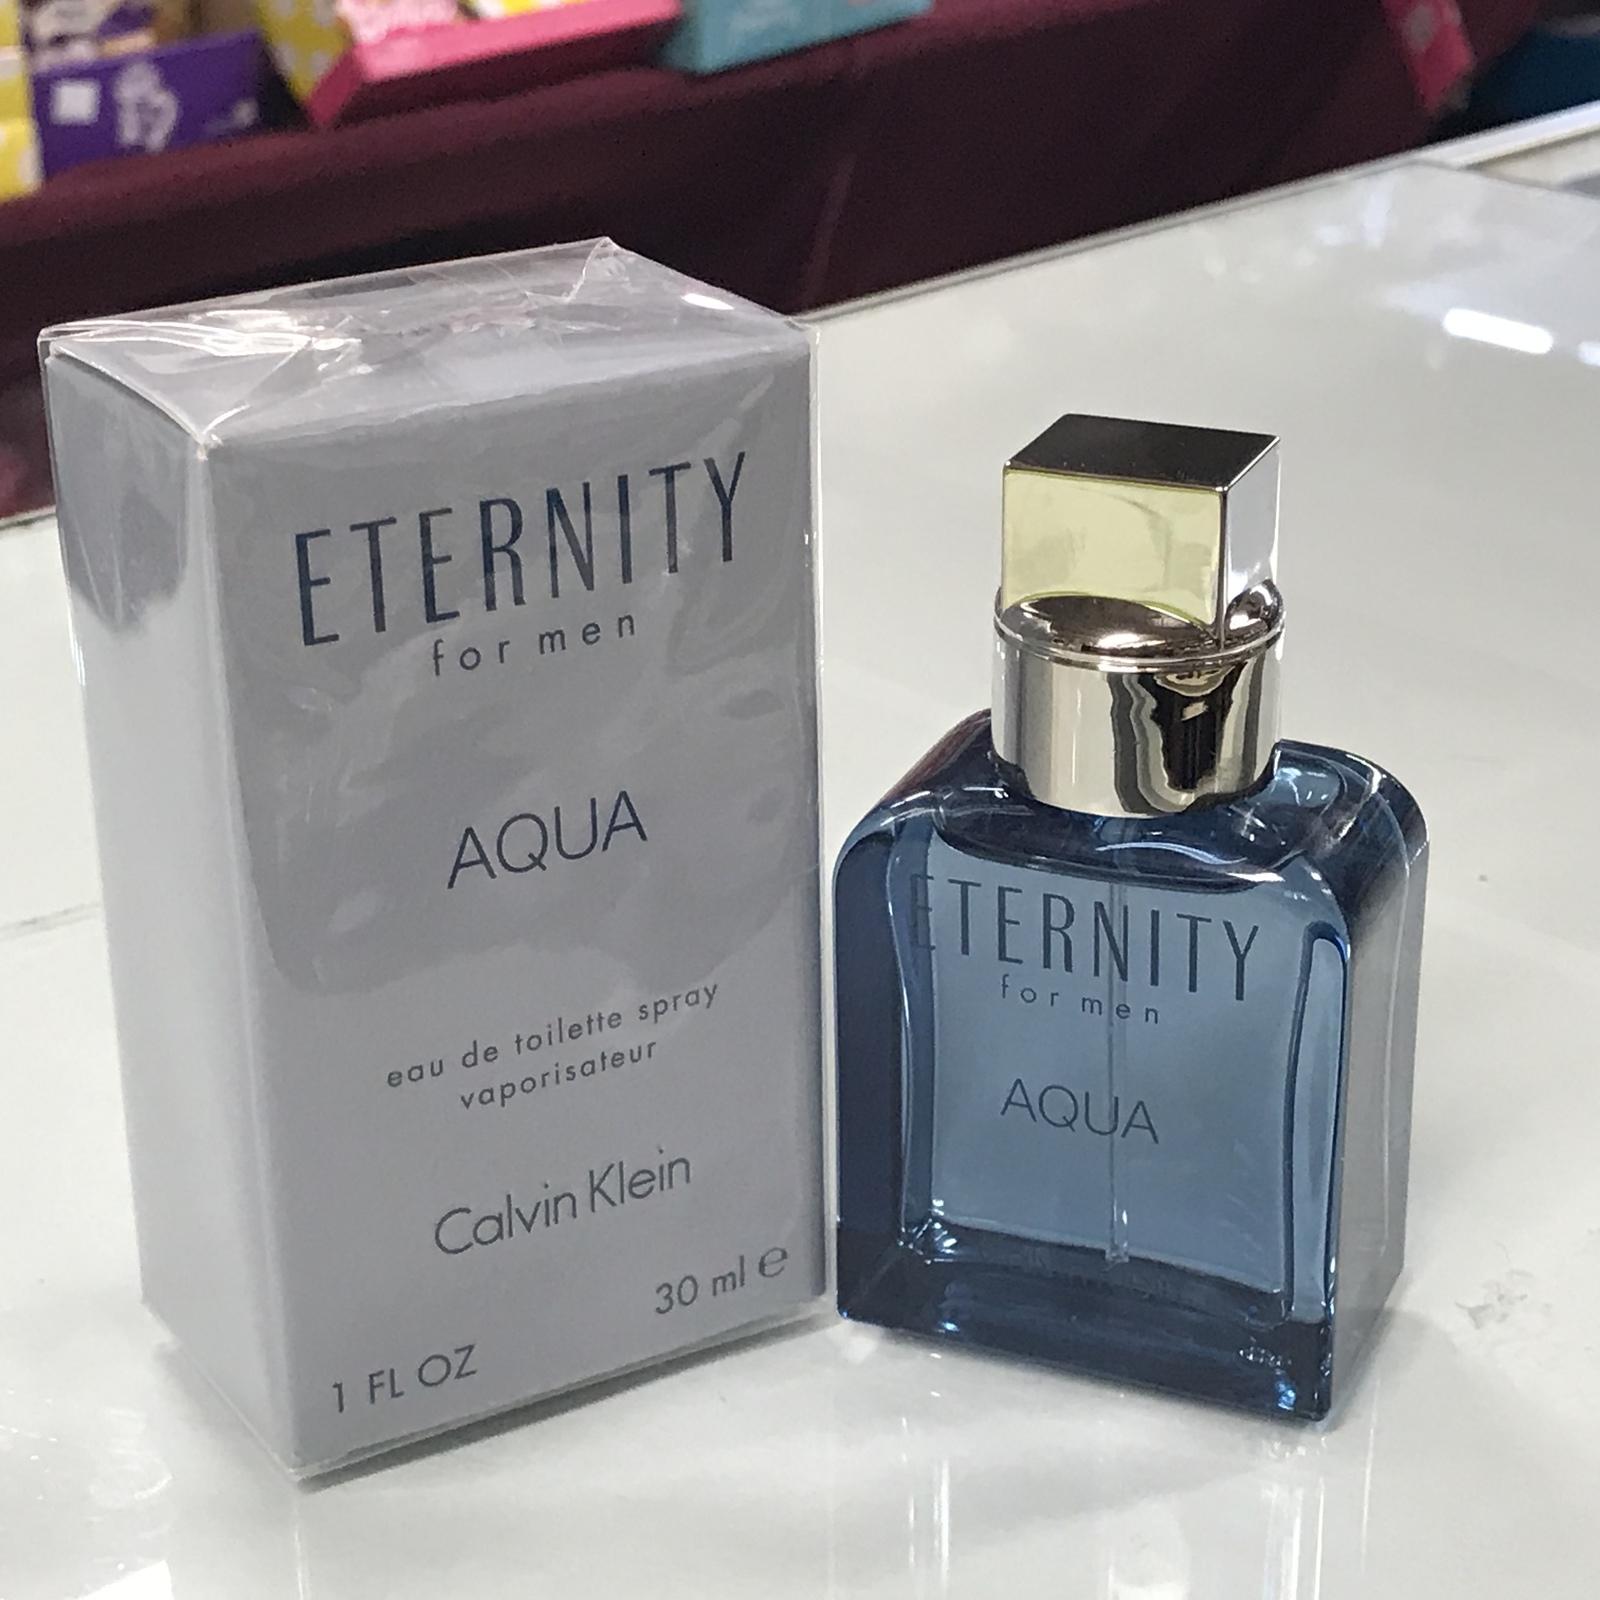 Eternity Aqua Calvin Klein for Men, 1.0 fl.oz / 30 ml eau de toilette spray